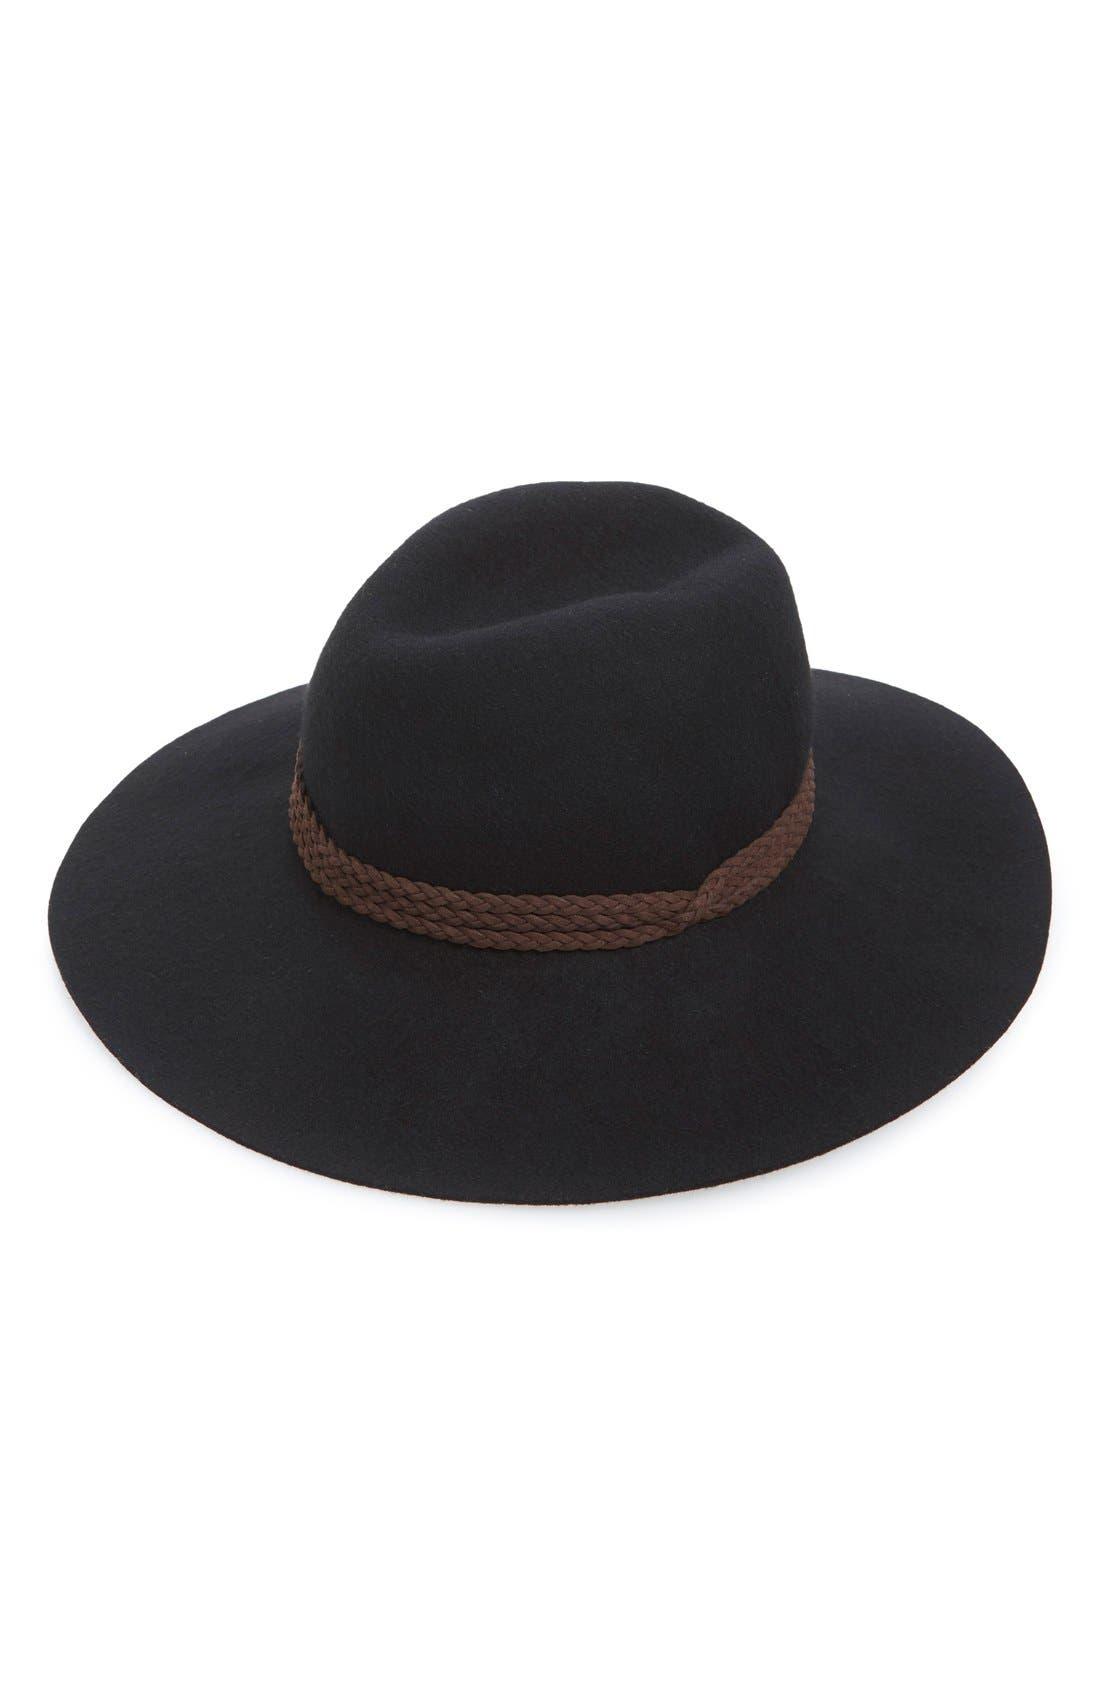 Floppy Wool Panama Hat,                         Main,                         color, 001